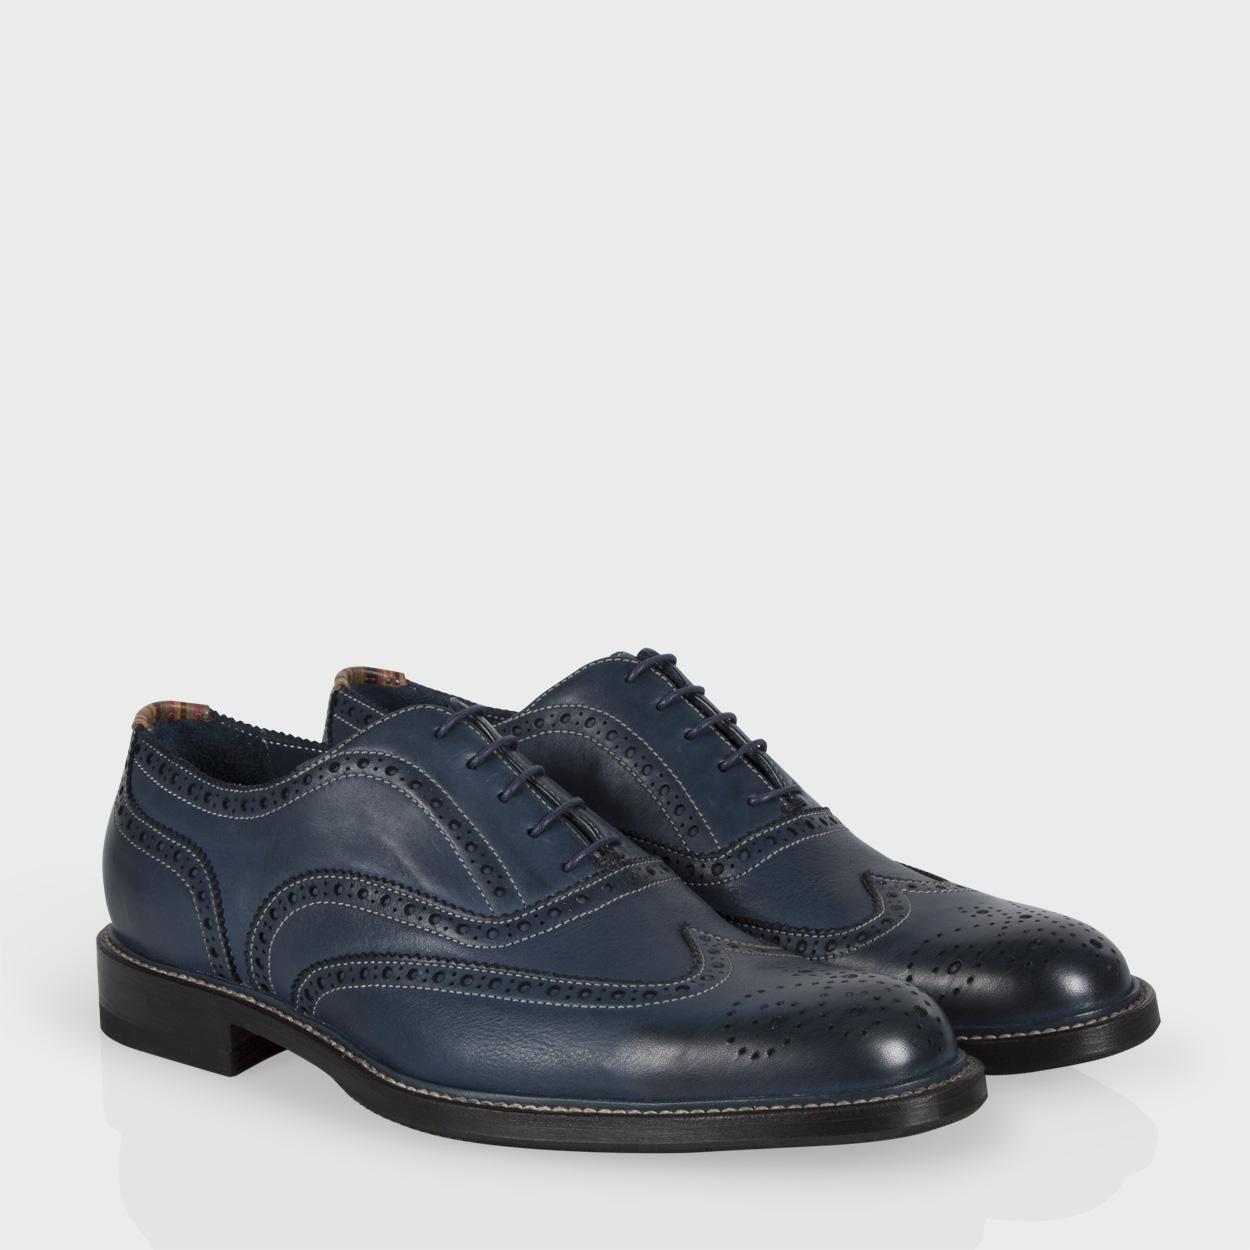 Garcia (FD) | Sandals, Shoes, Fashion